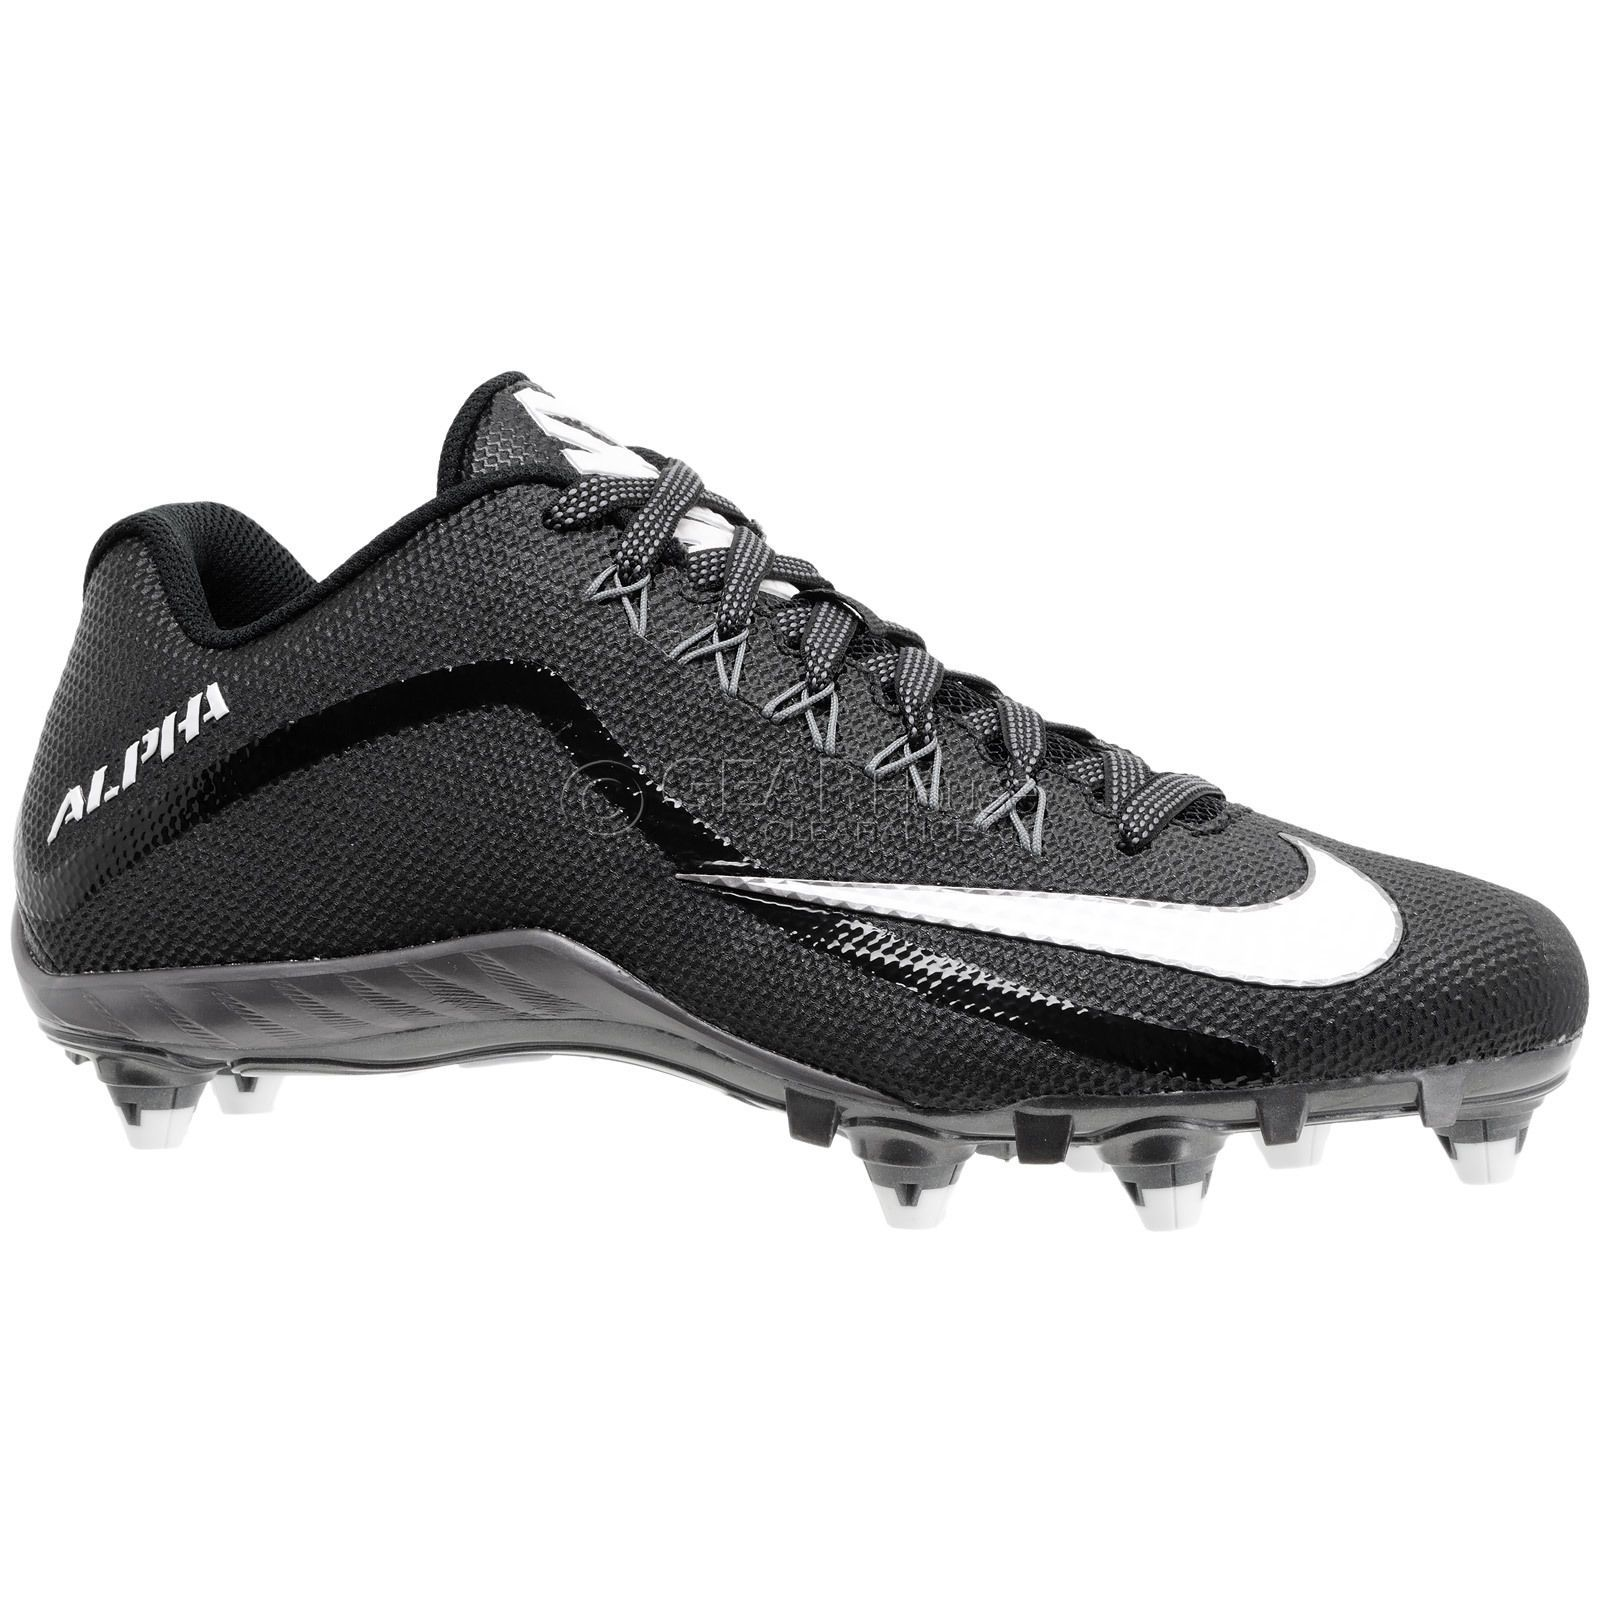 NIKE Alpha Pro 2 Low D Black White Detachable Football Cleats Mens 10 12 13 13.5 886066062592